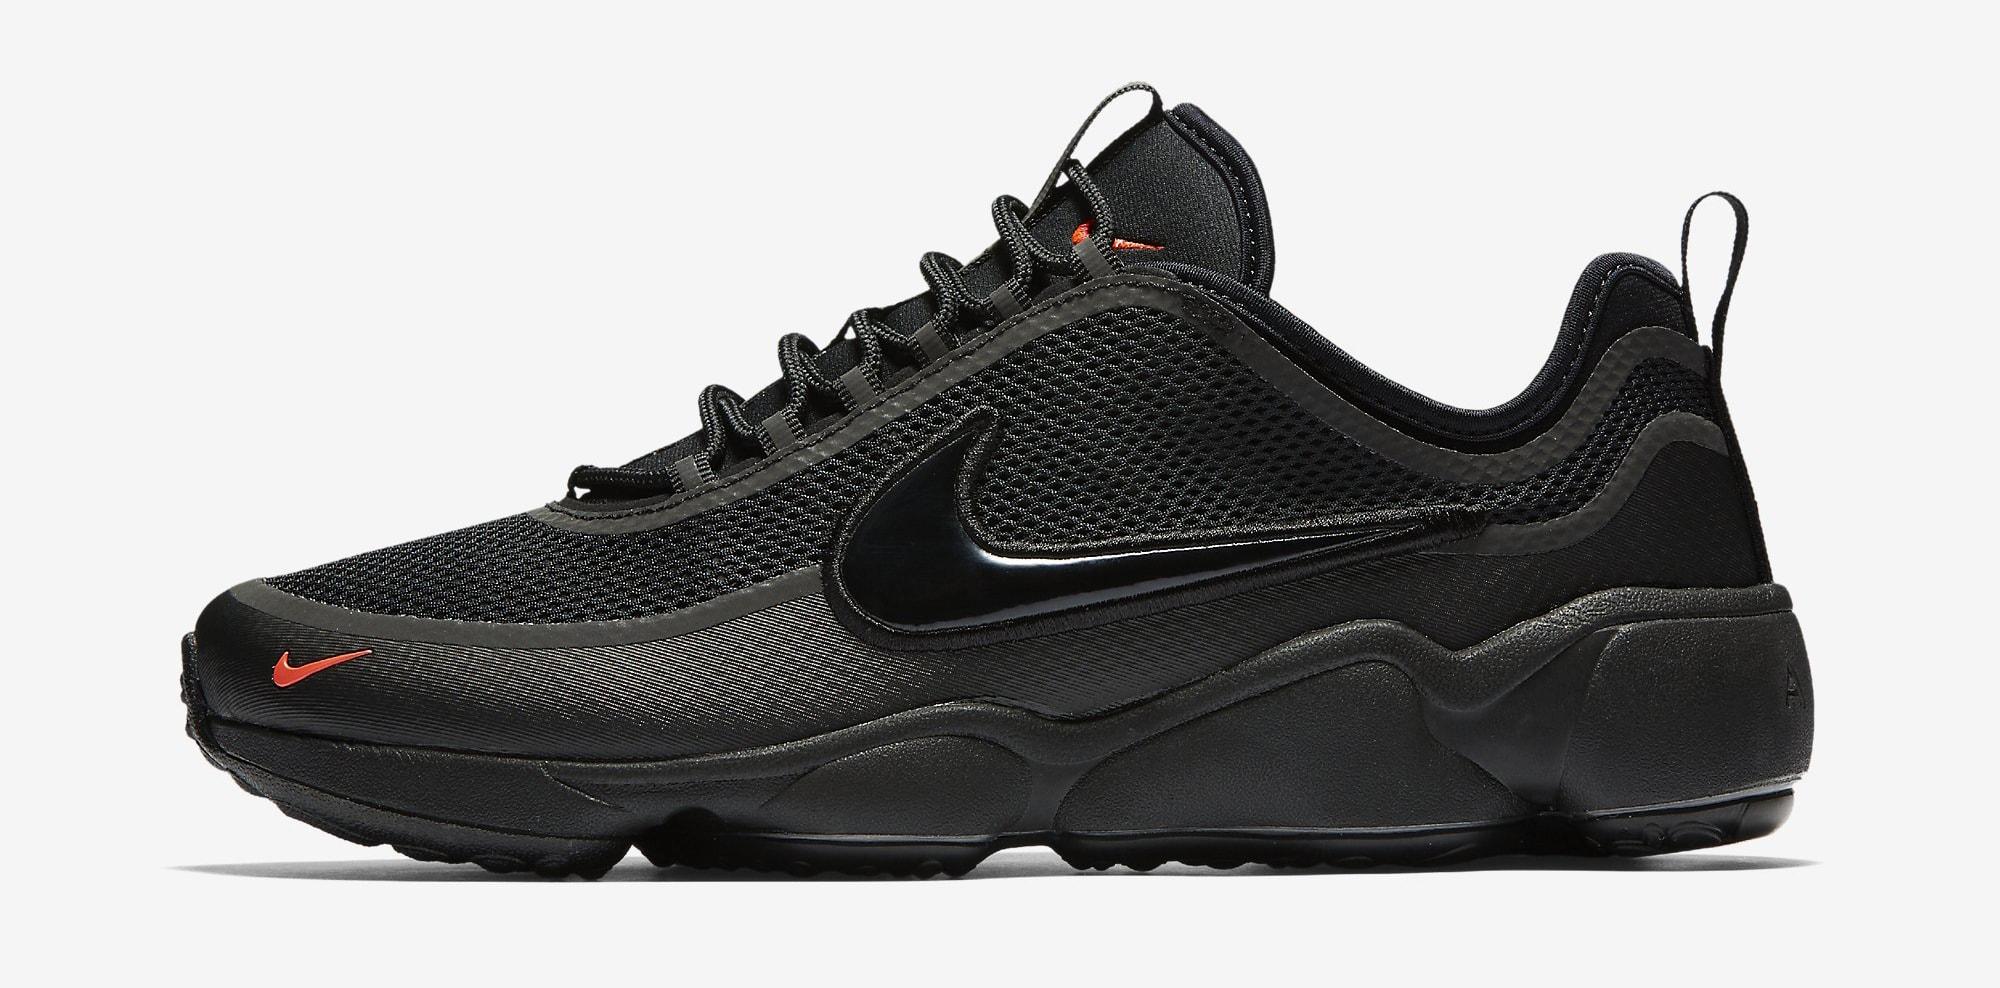 Nike Zoom Spiridon Ultra Black 876267-002 Profile